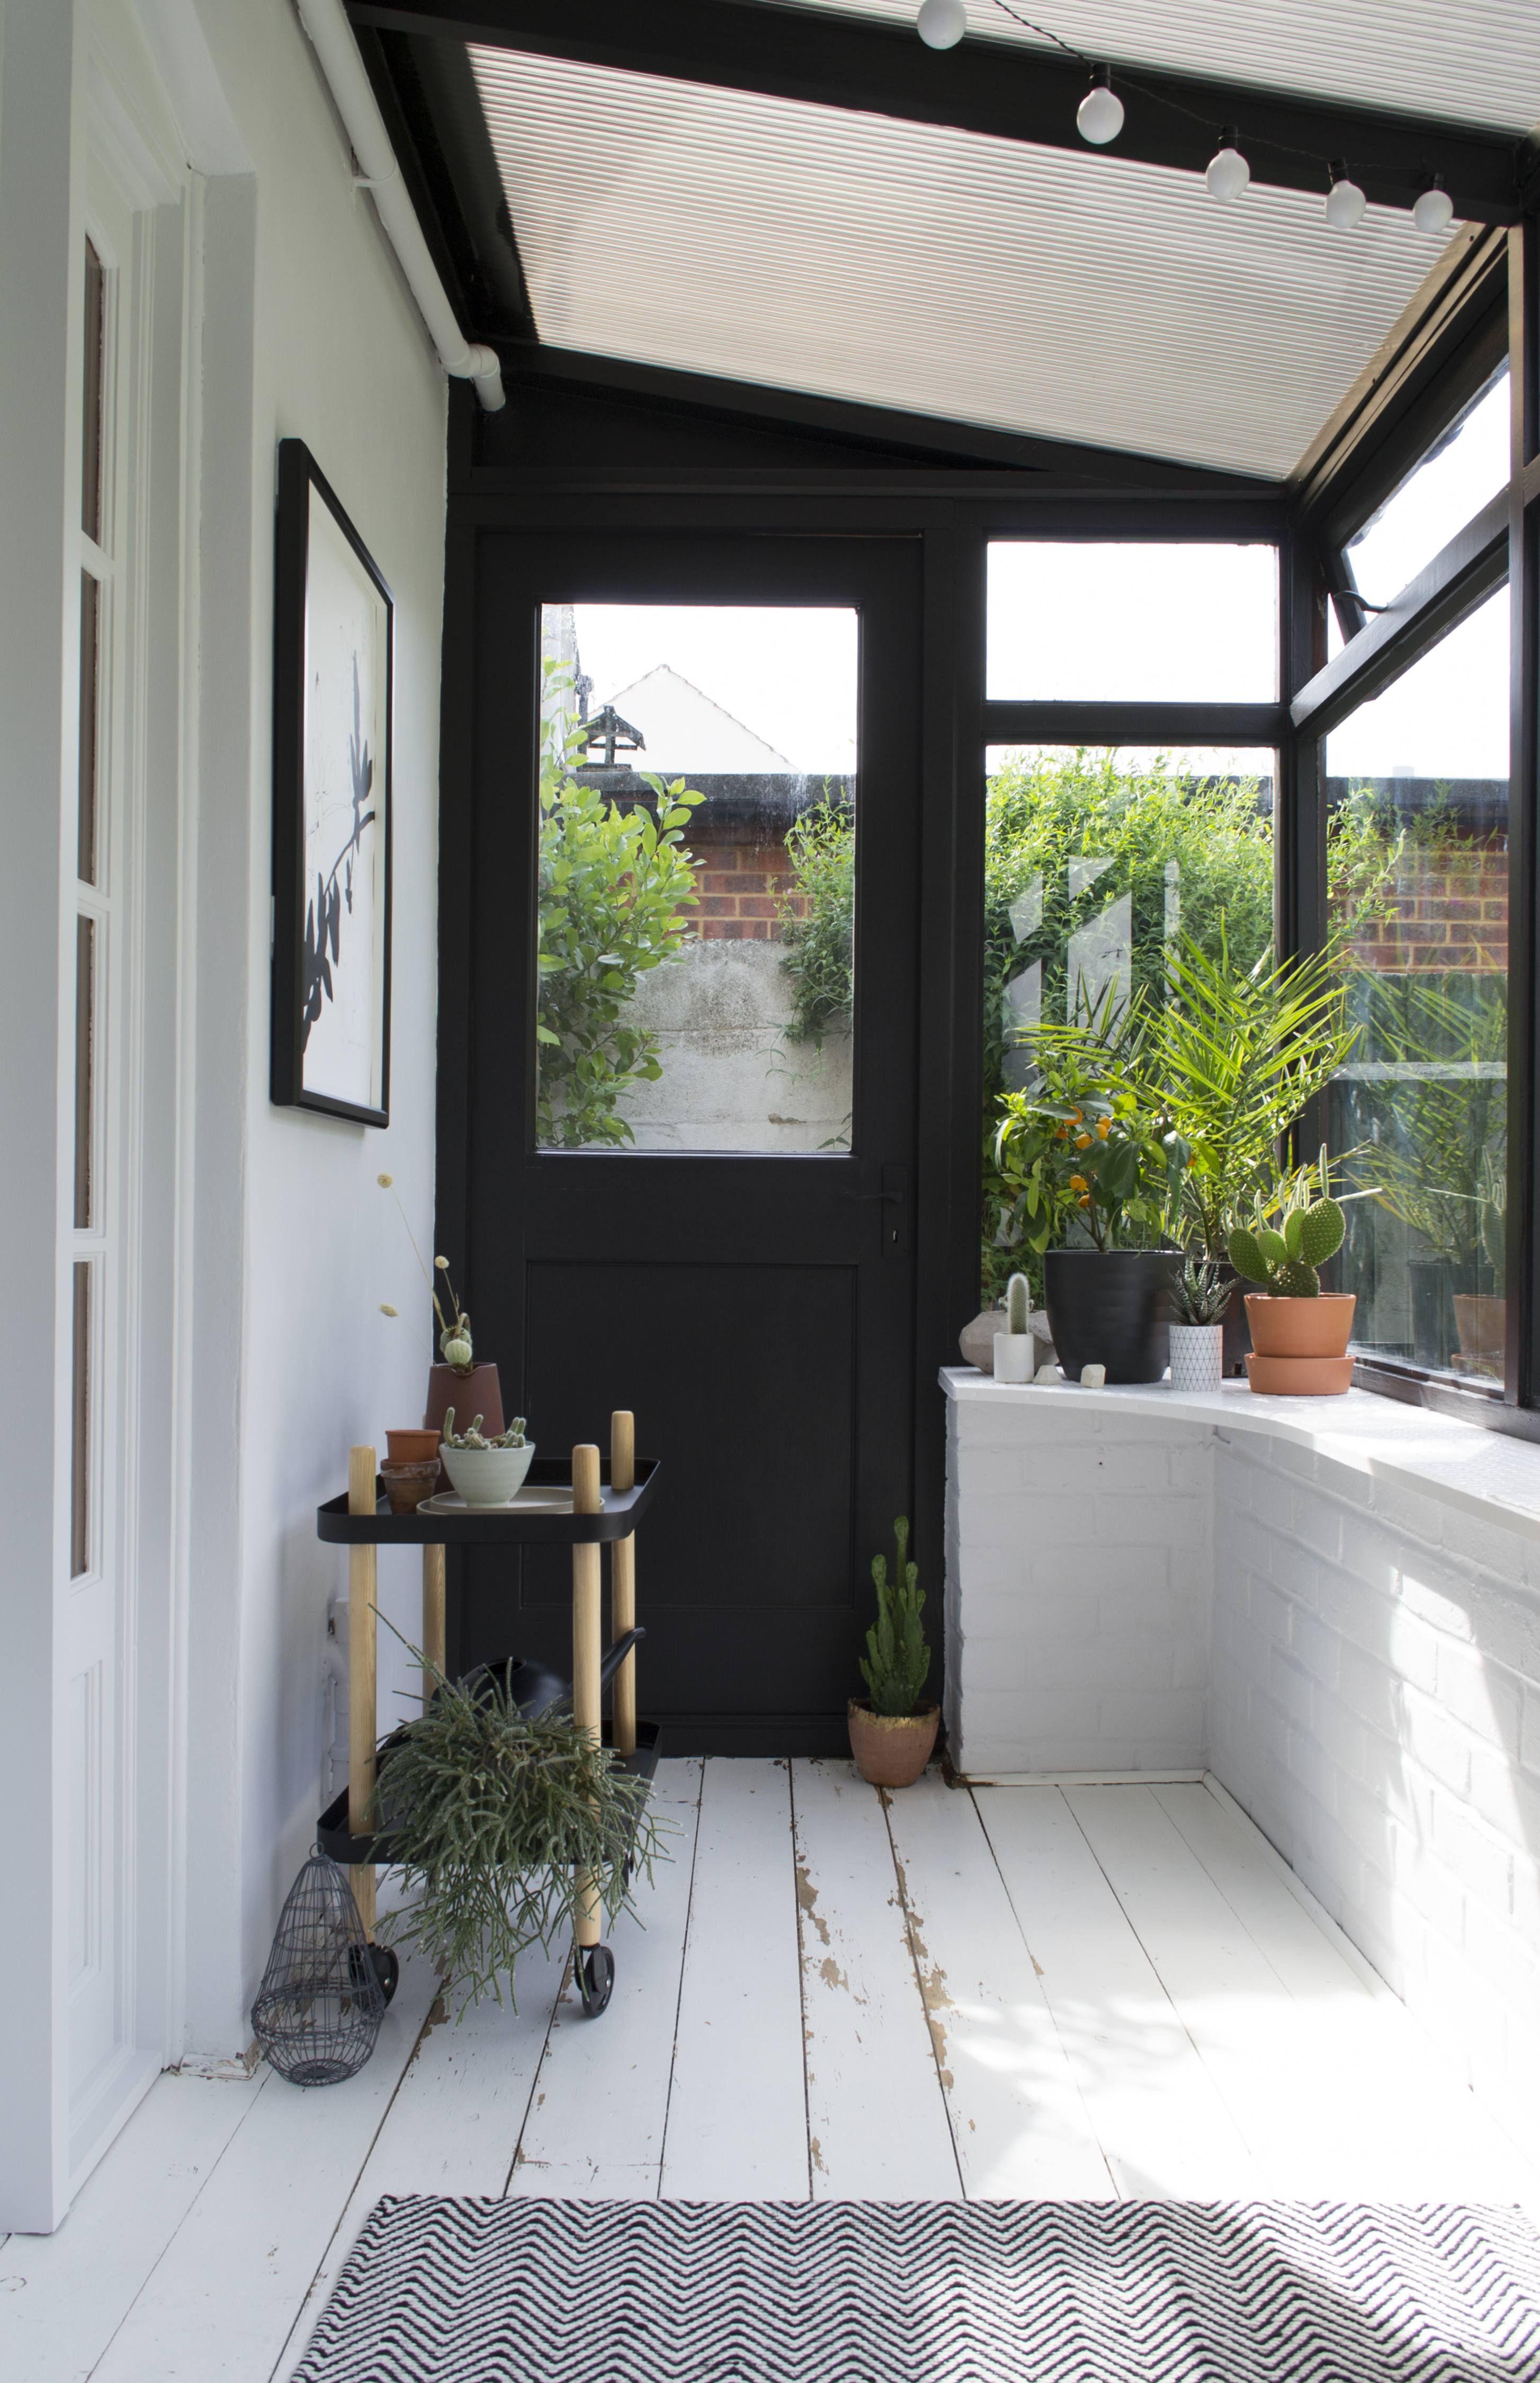 entrance, white wooden floor, white brick wall, black door, glass window